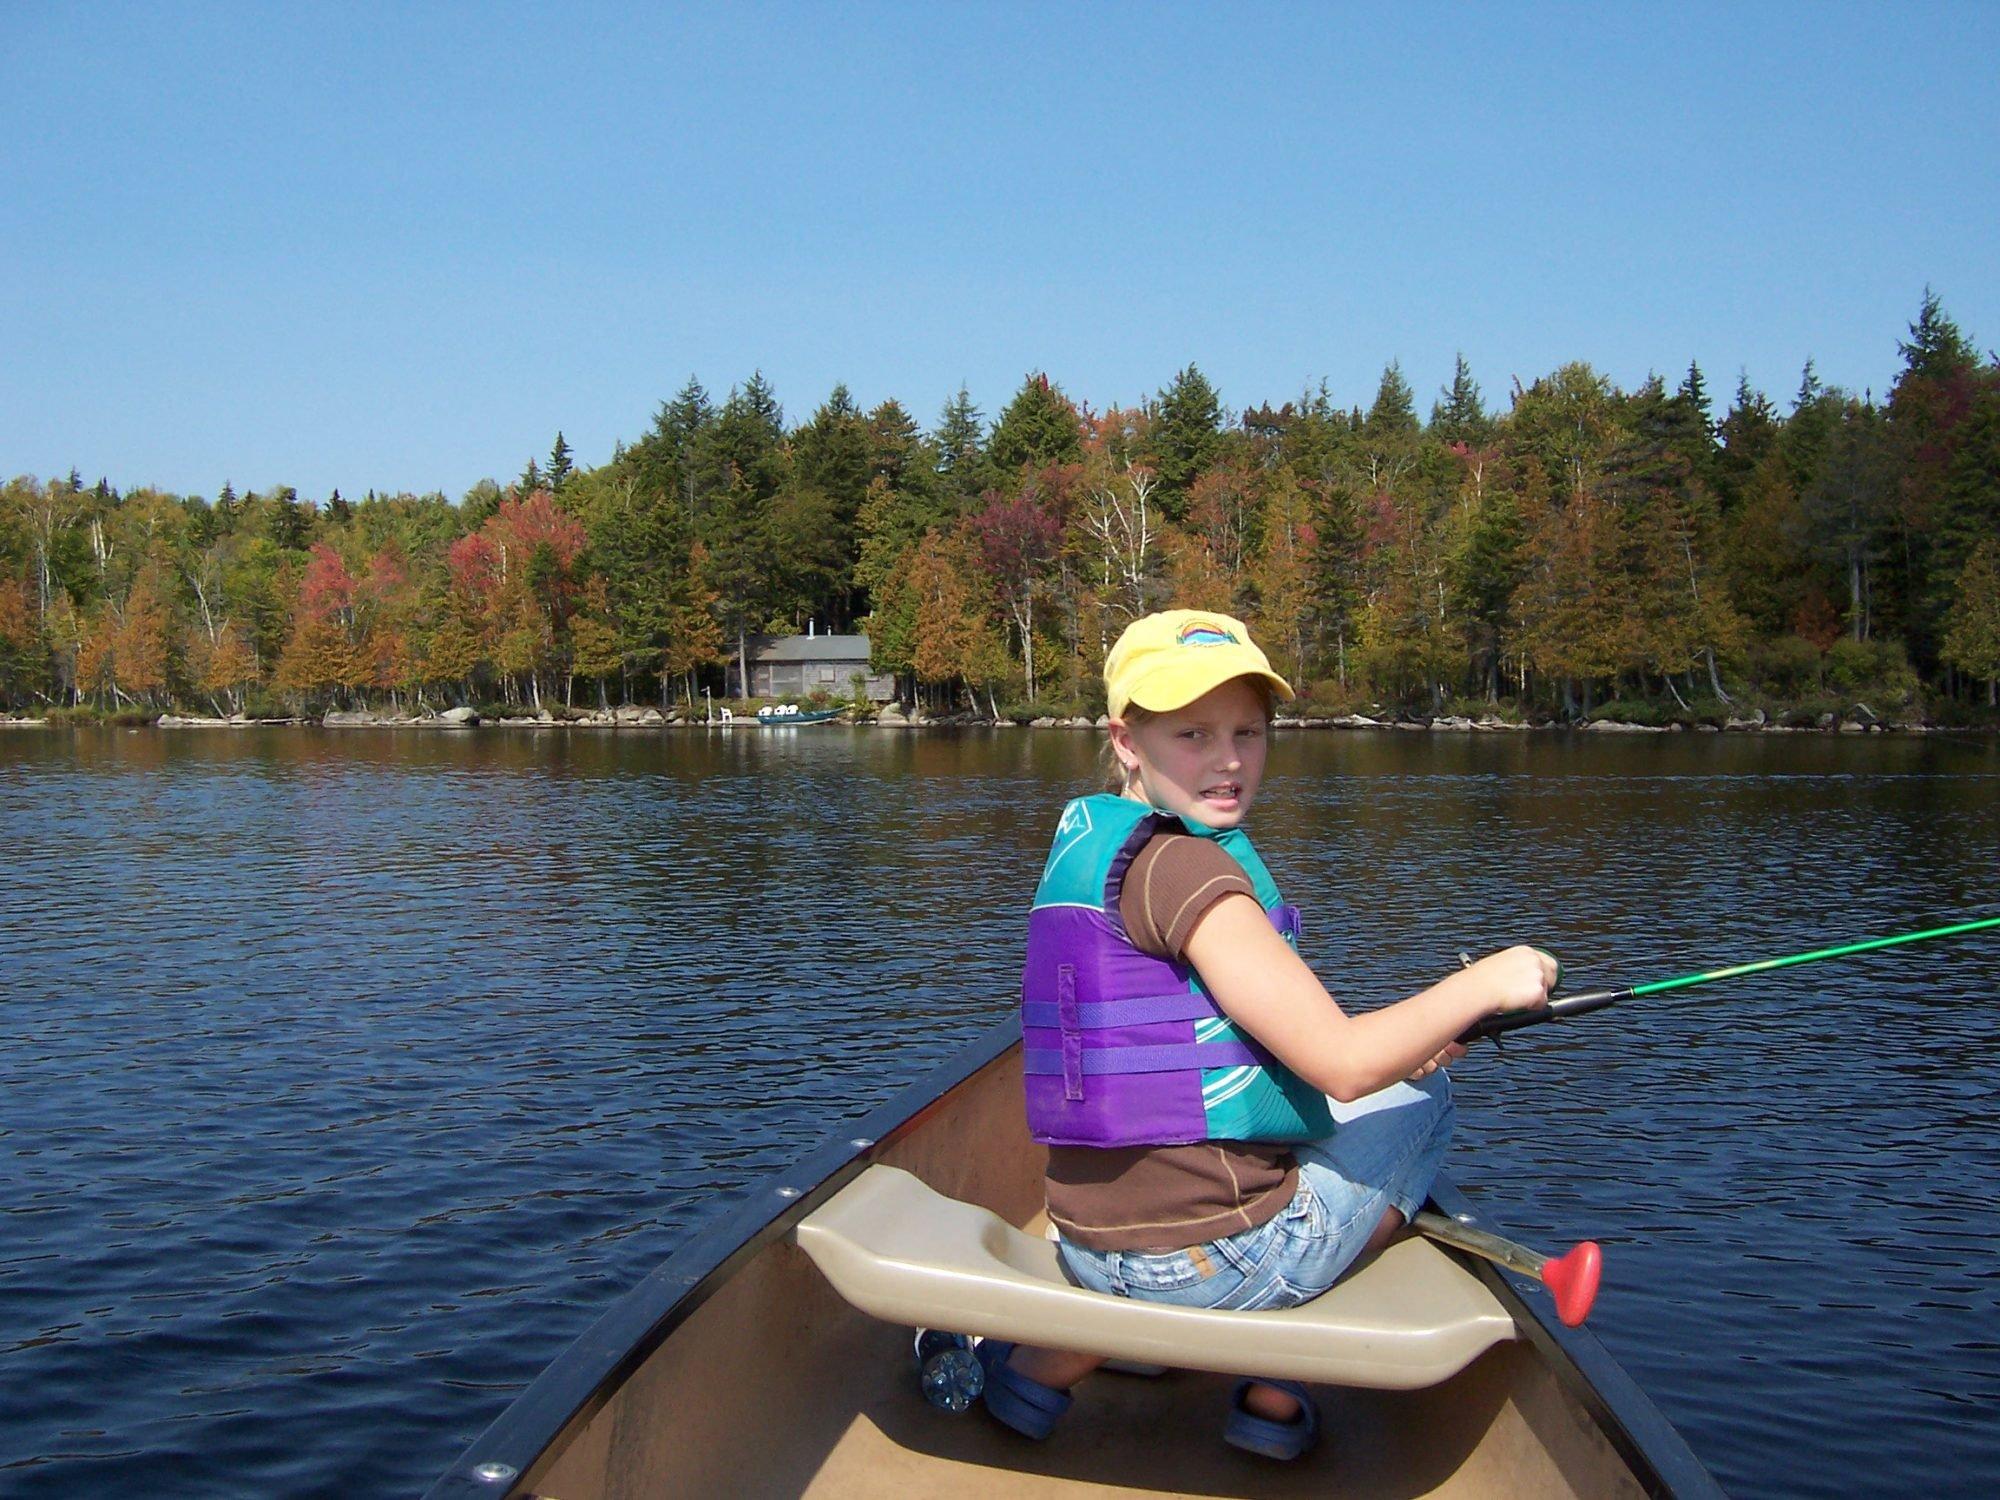 Moosehead hills cabins rustic luxury log cabin rentals for Fishing near me lake